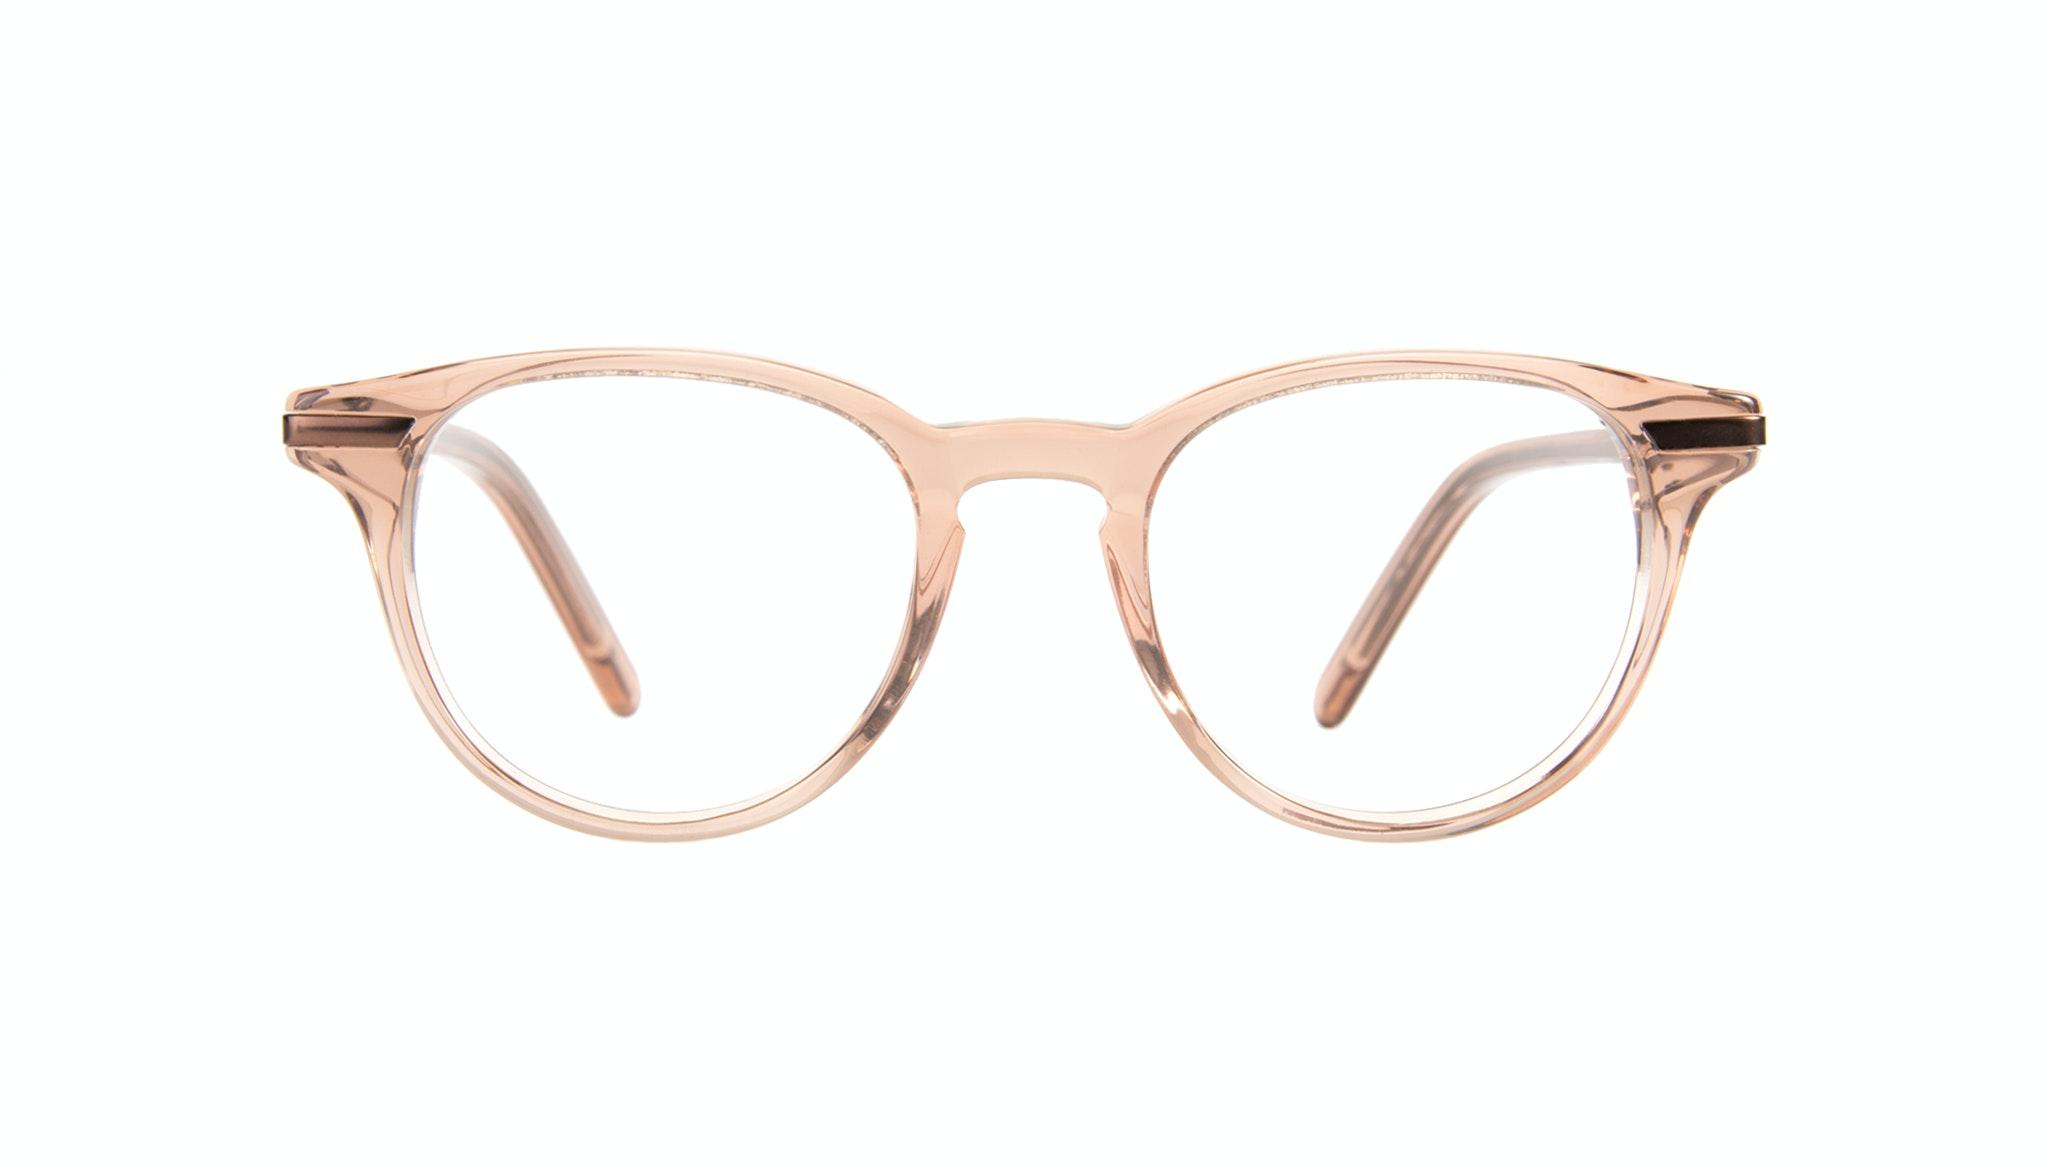 Affordable Fashion Glasses Round Eyeglasses Women Spark Rose